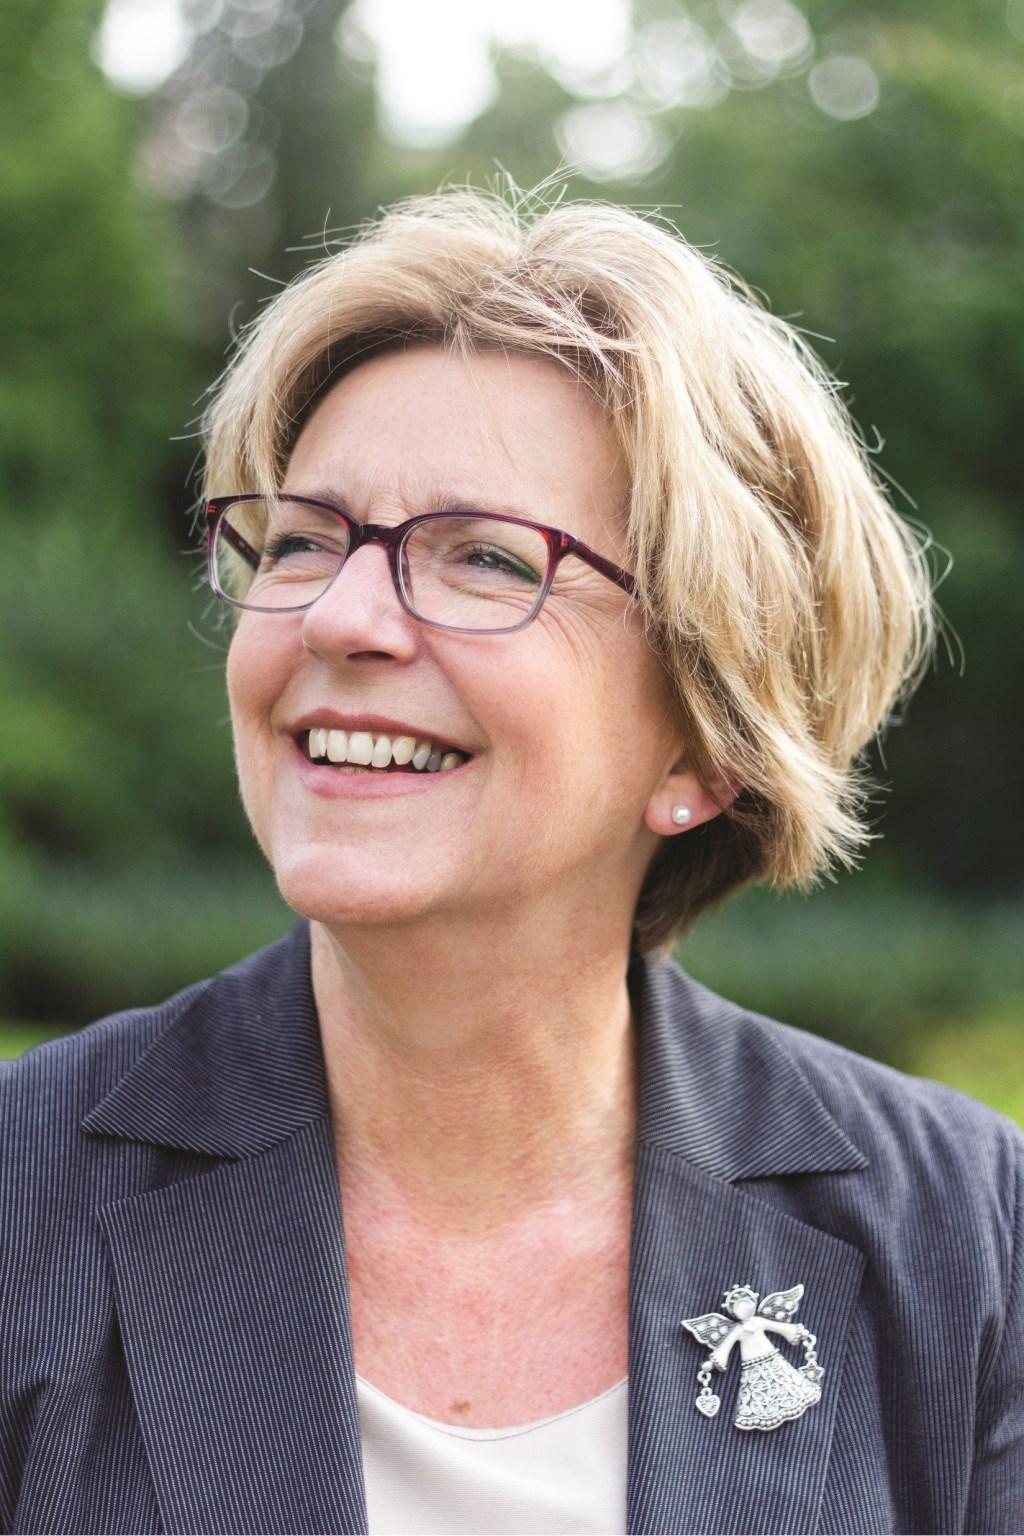 Burgemeester Ellen Nauta. Foto: Gemeente Hof van Twente